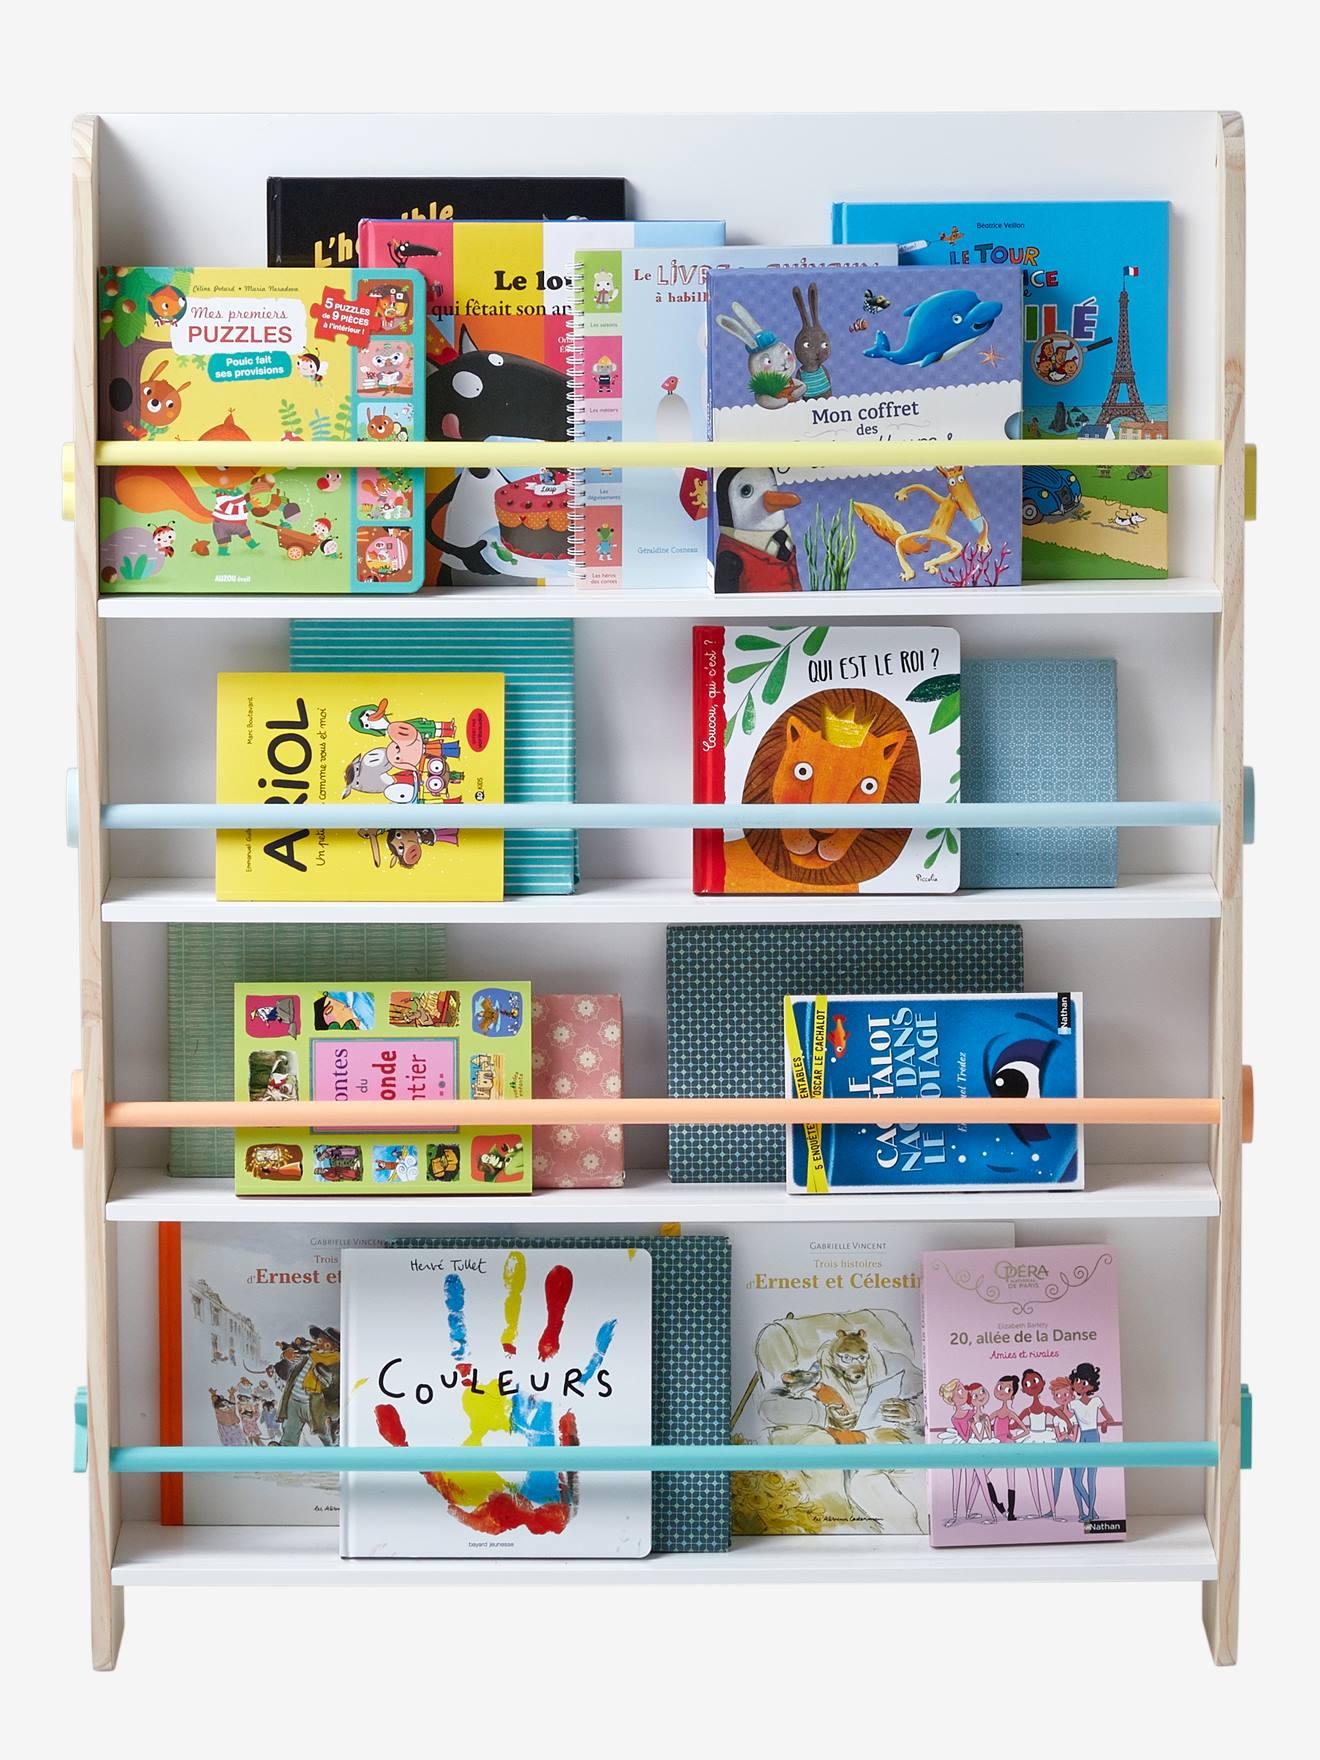 Full Size of Kinderzimmer Bücherregal Vertbaudet Bcherregal Regal Weiß Sofa Regale Kinderzimmer Kinderzimmer Bücherregal